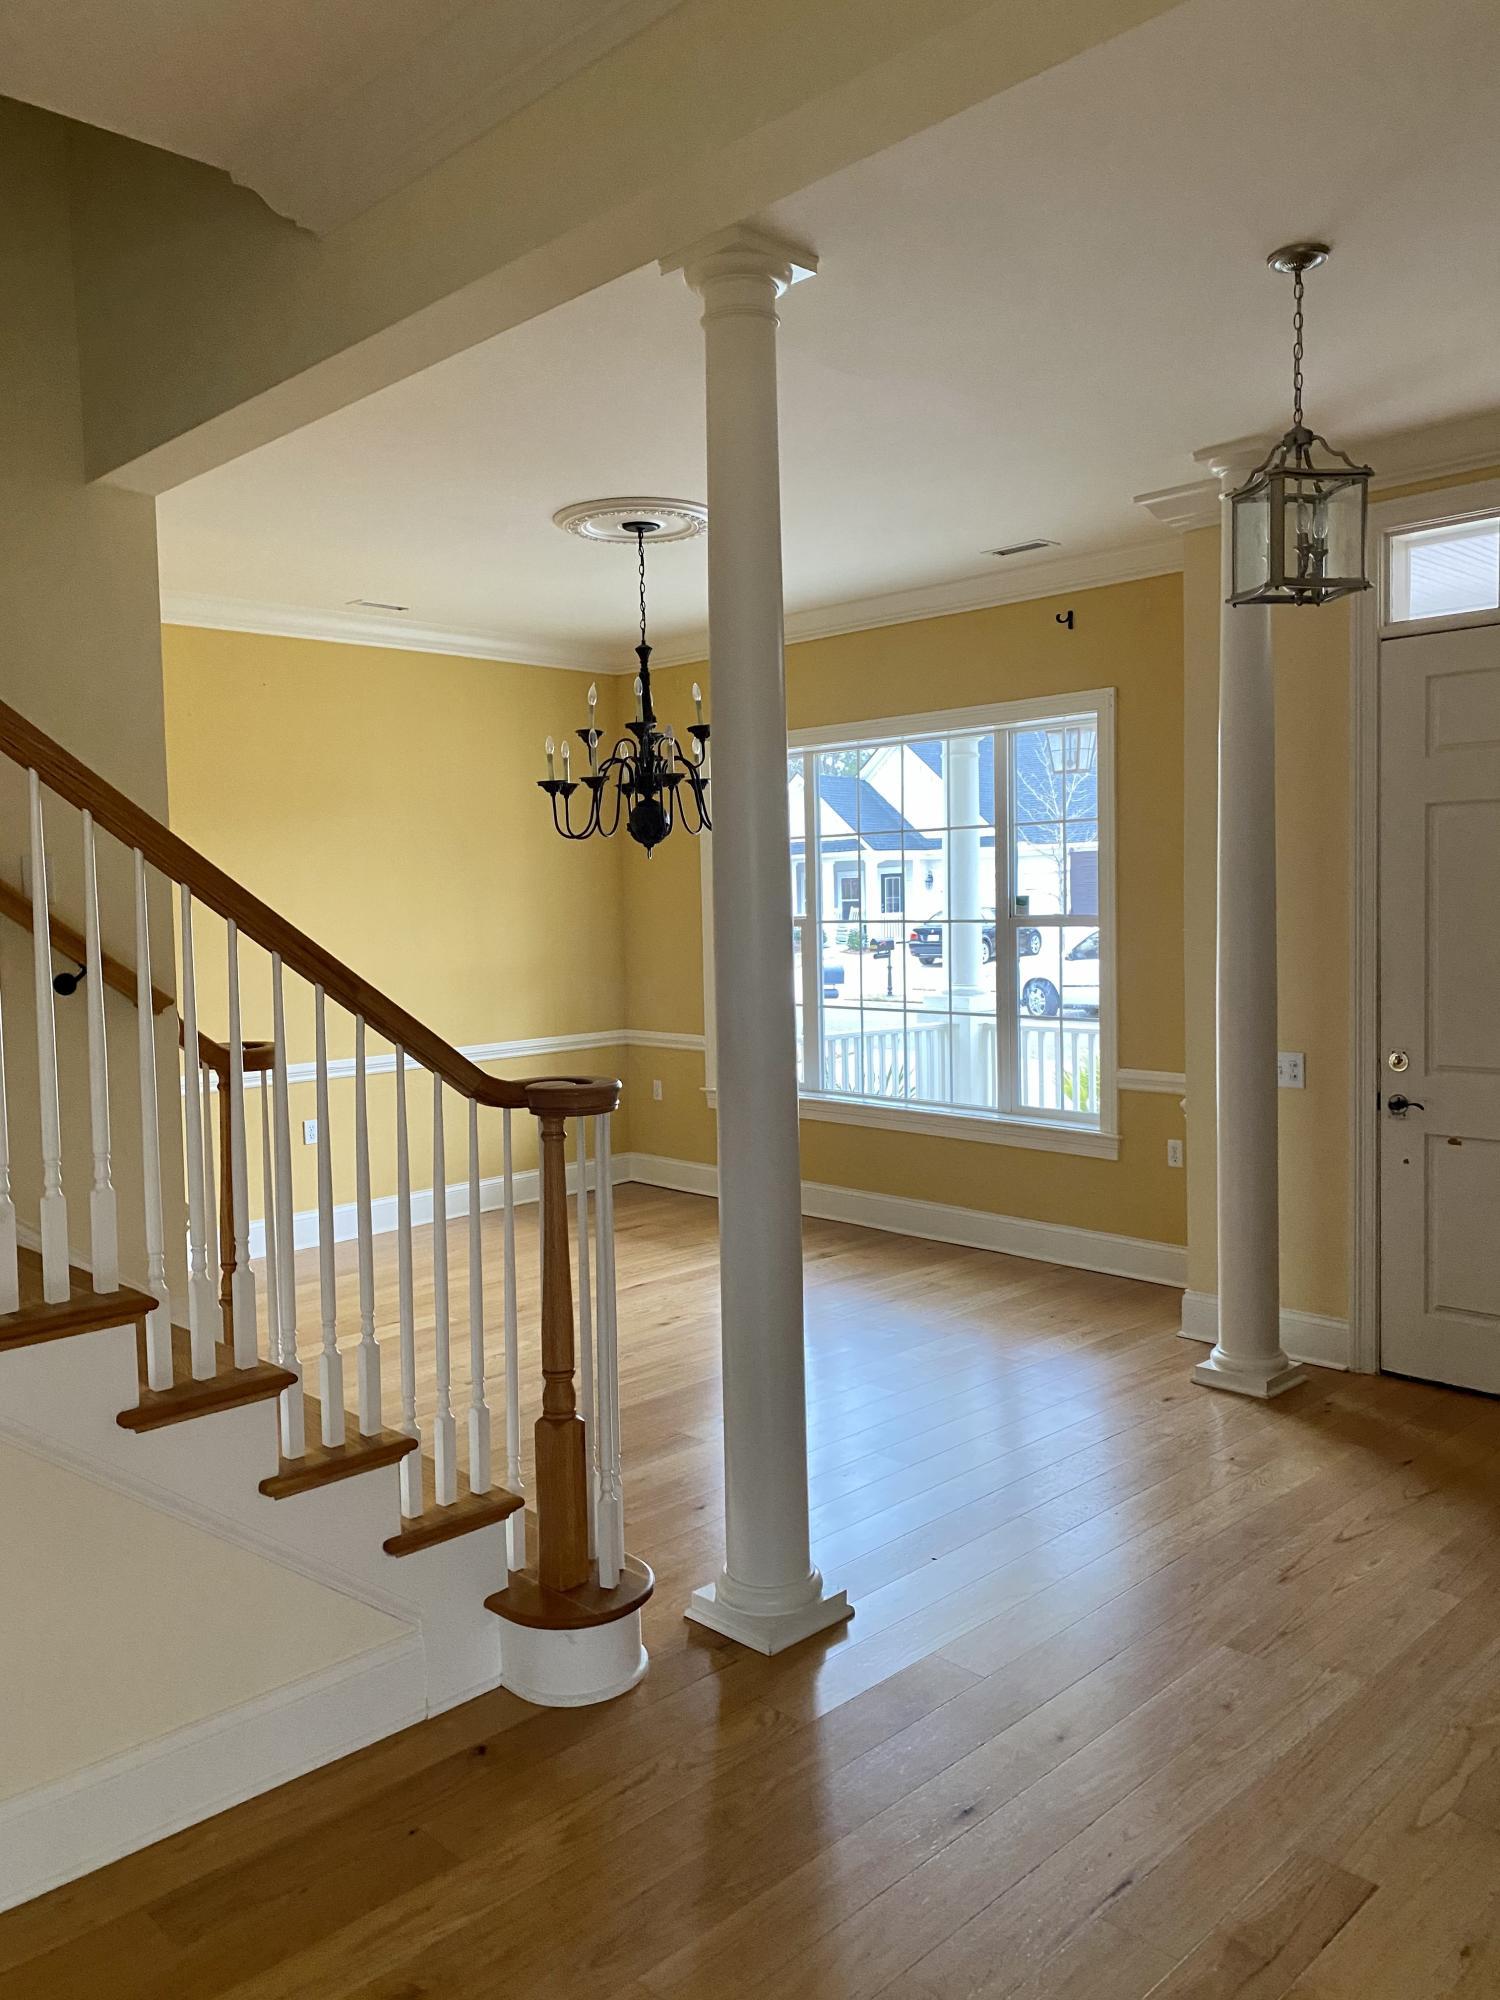 Park West Homes For Sale - 3090 Rice Field, Mount Pleasant, SC - 3